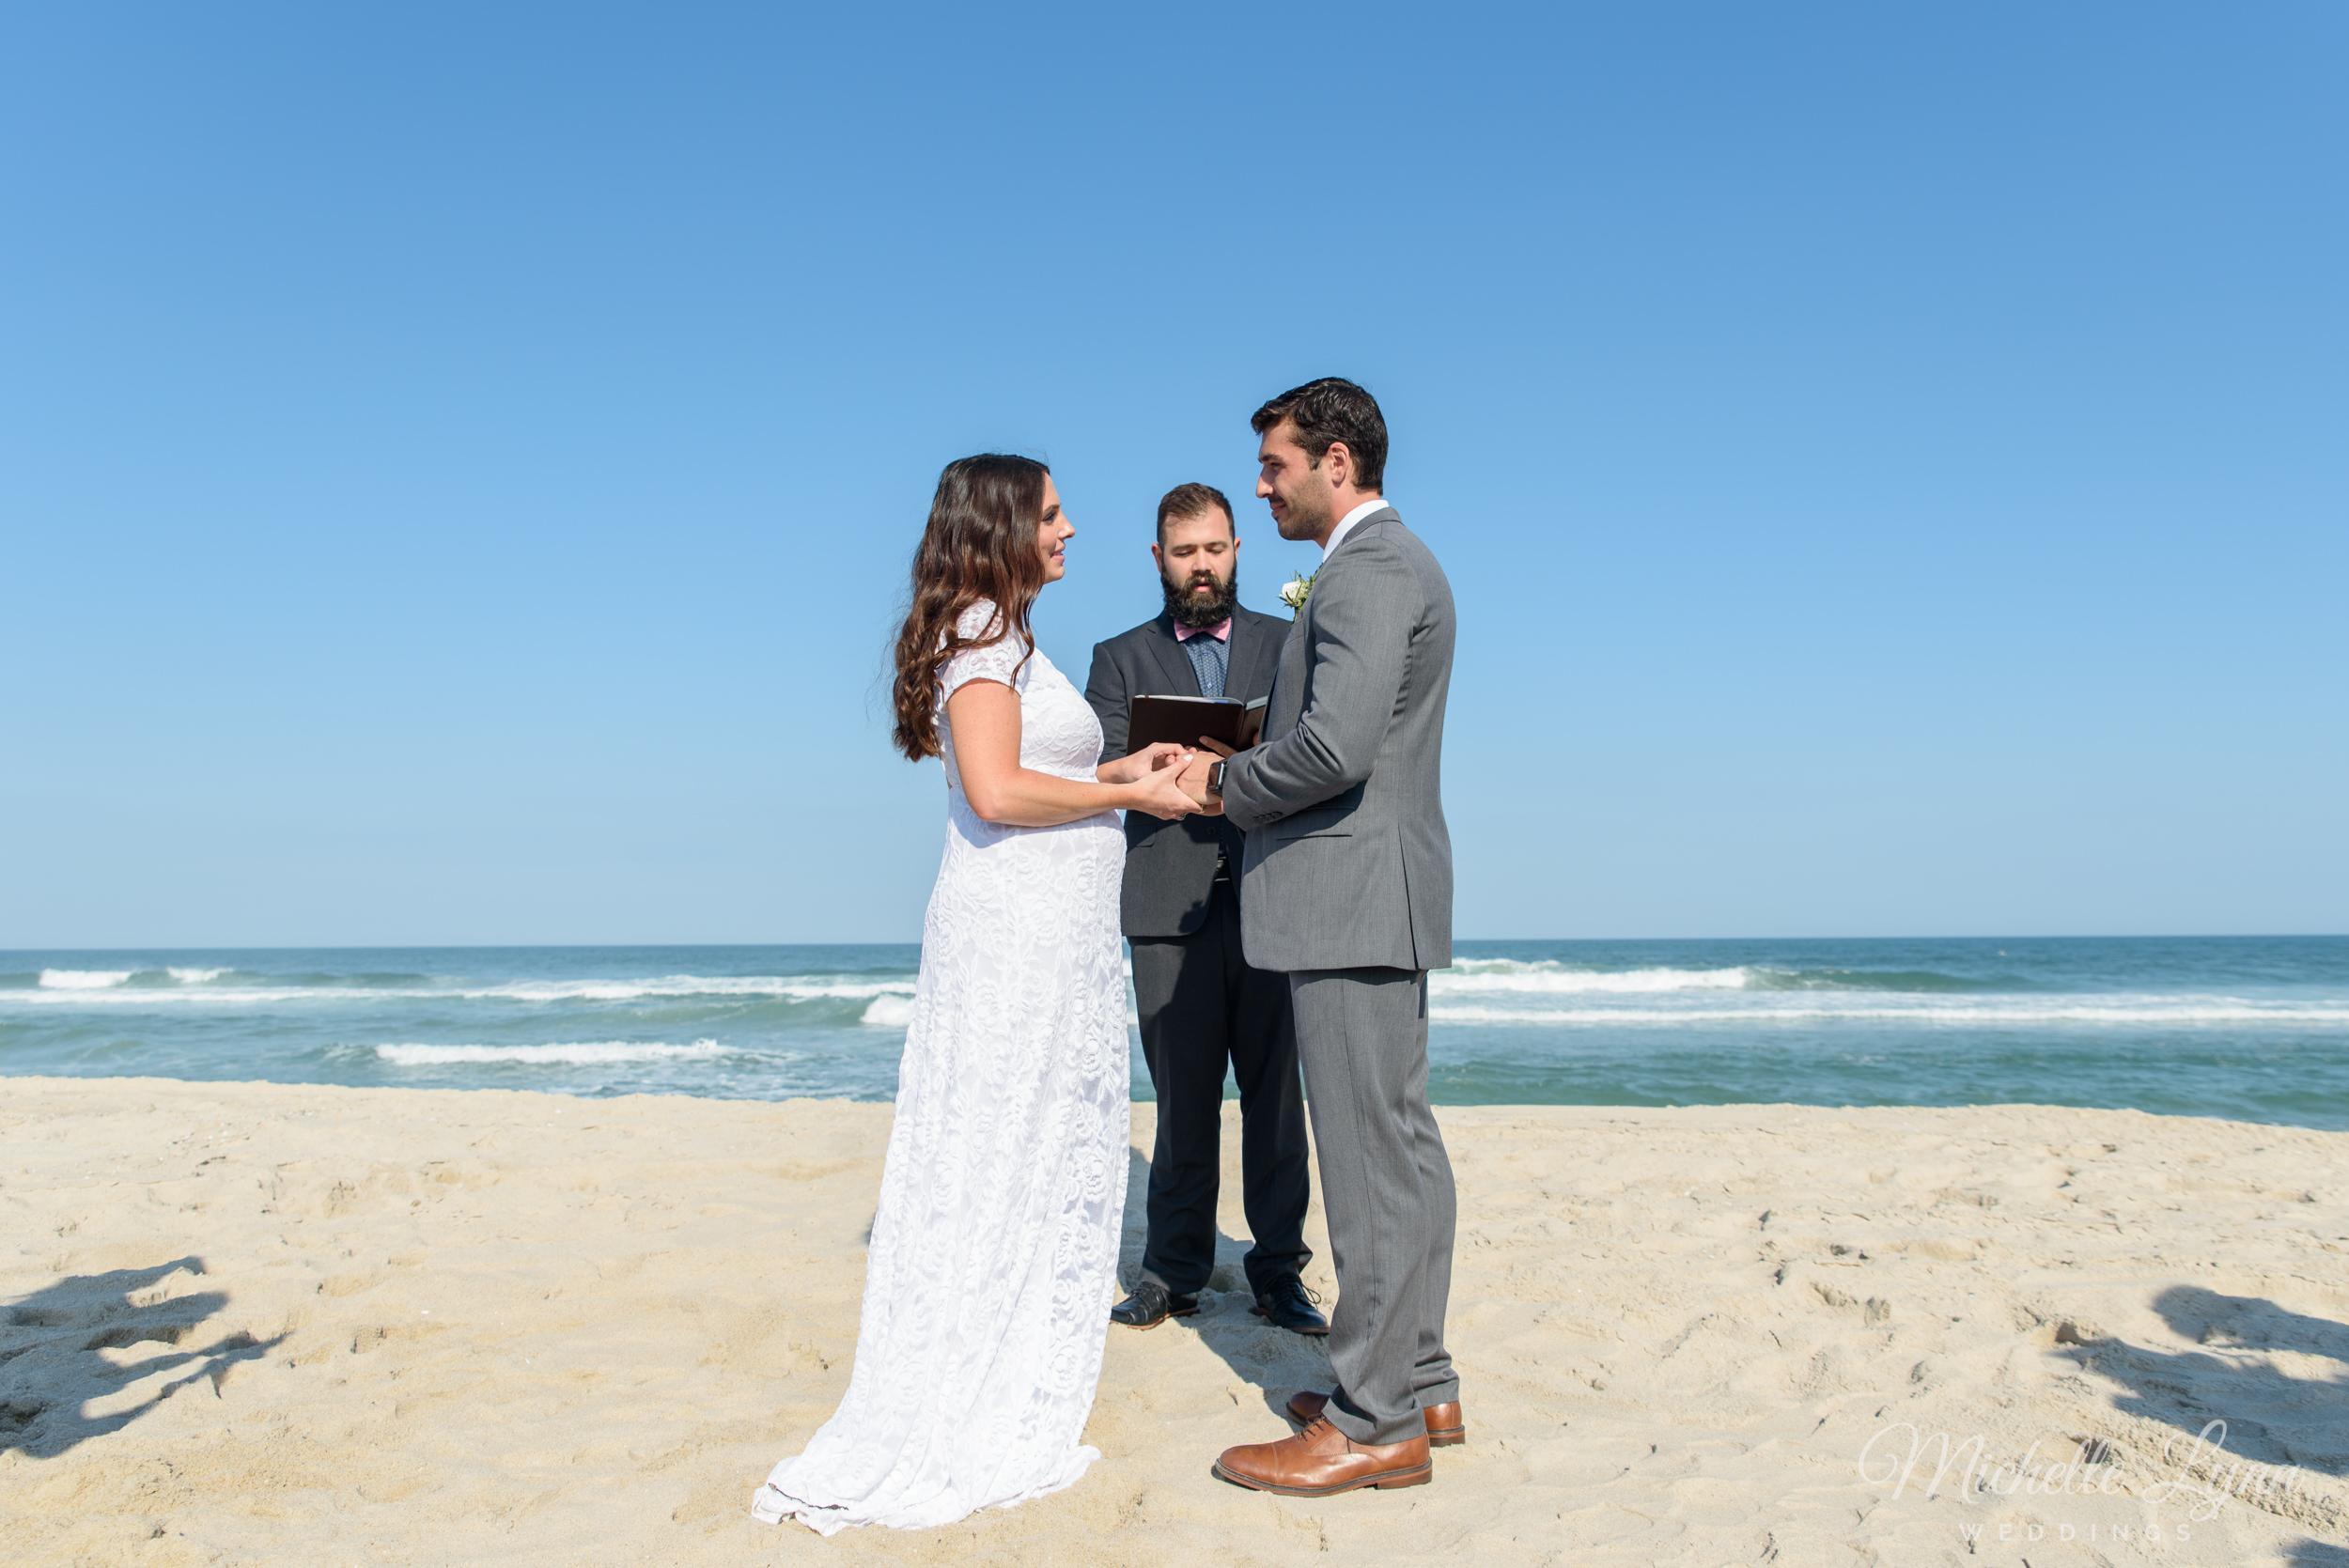 mlw-brant-beach-lbi-wedding-photography-31.jpg